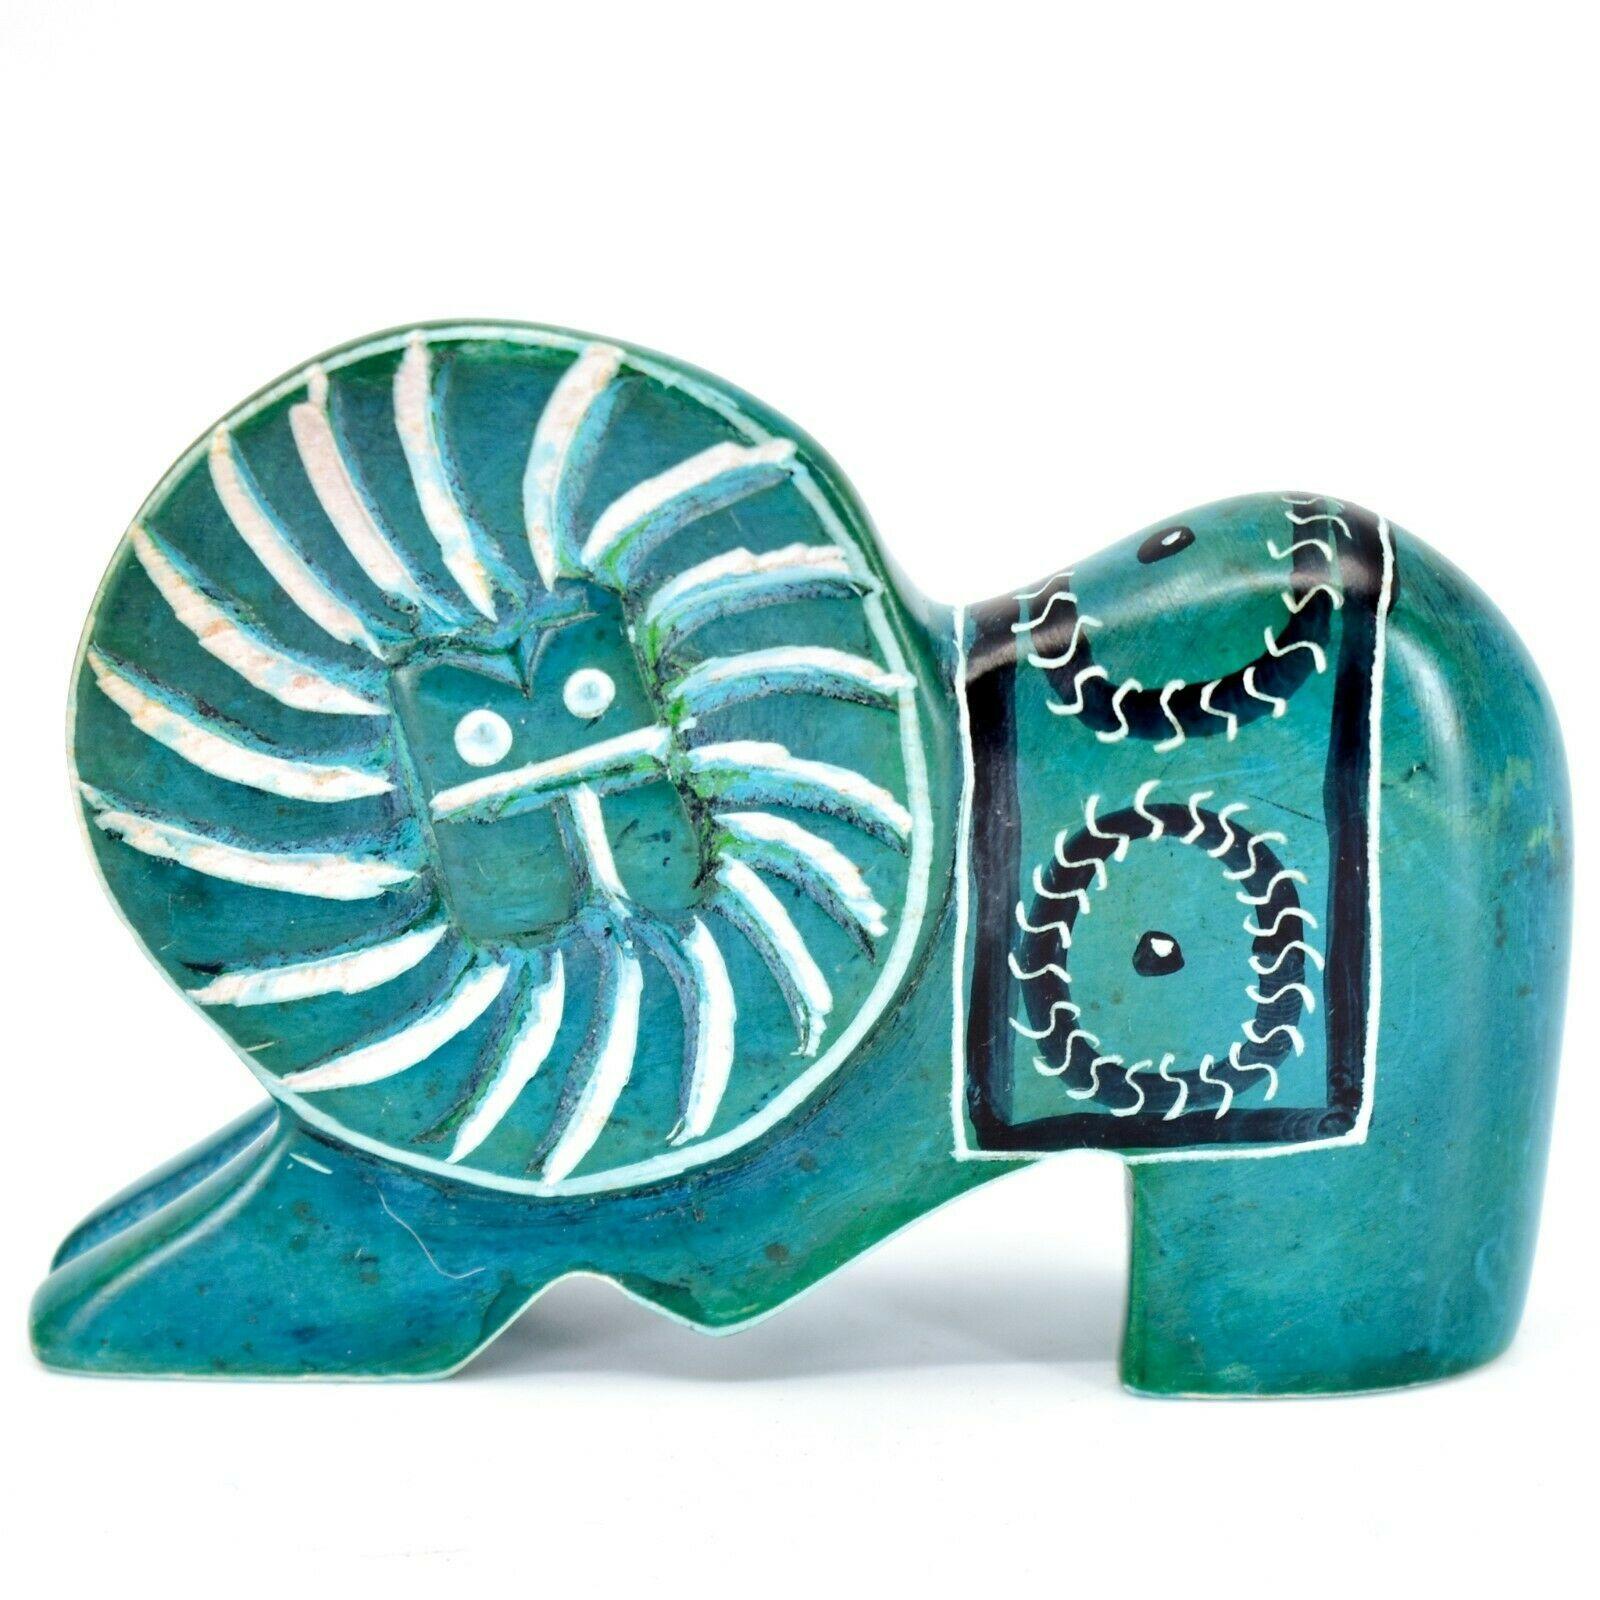 Crafts Caravan Hand Carved Soapstone Turquoise Elephant Figurine Made in Kenya